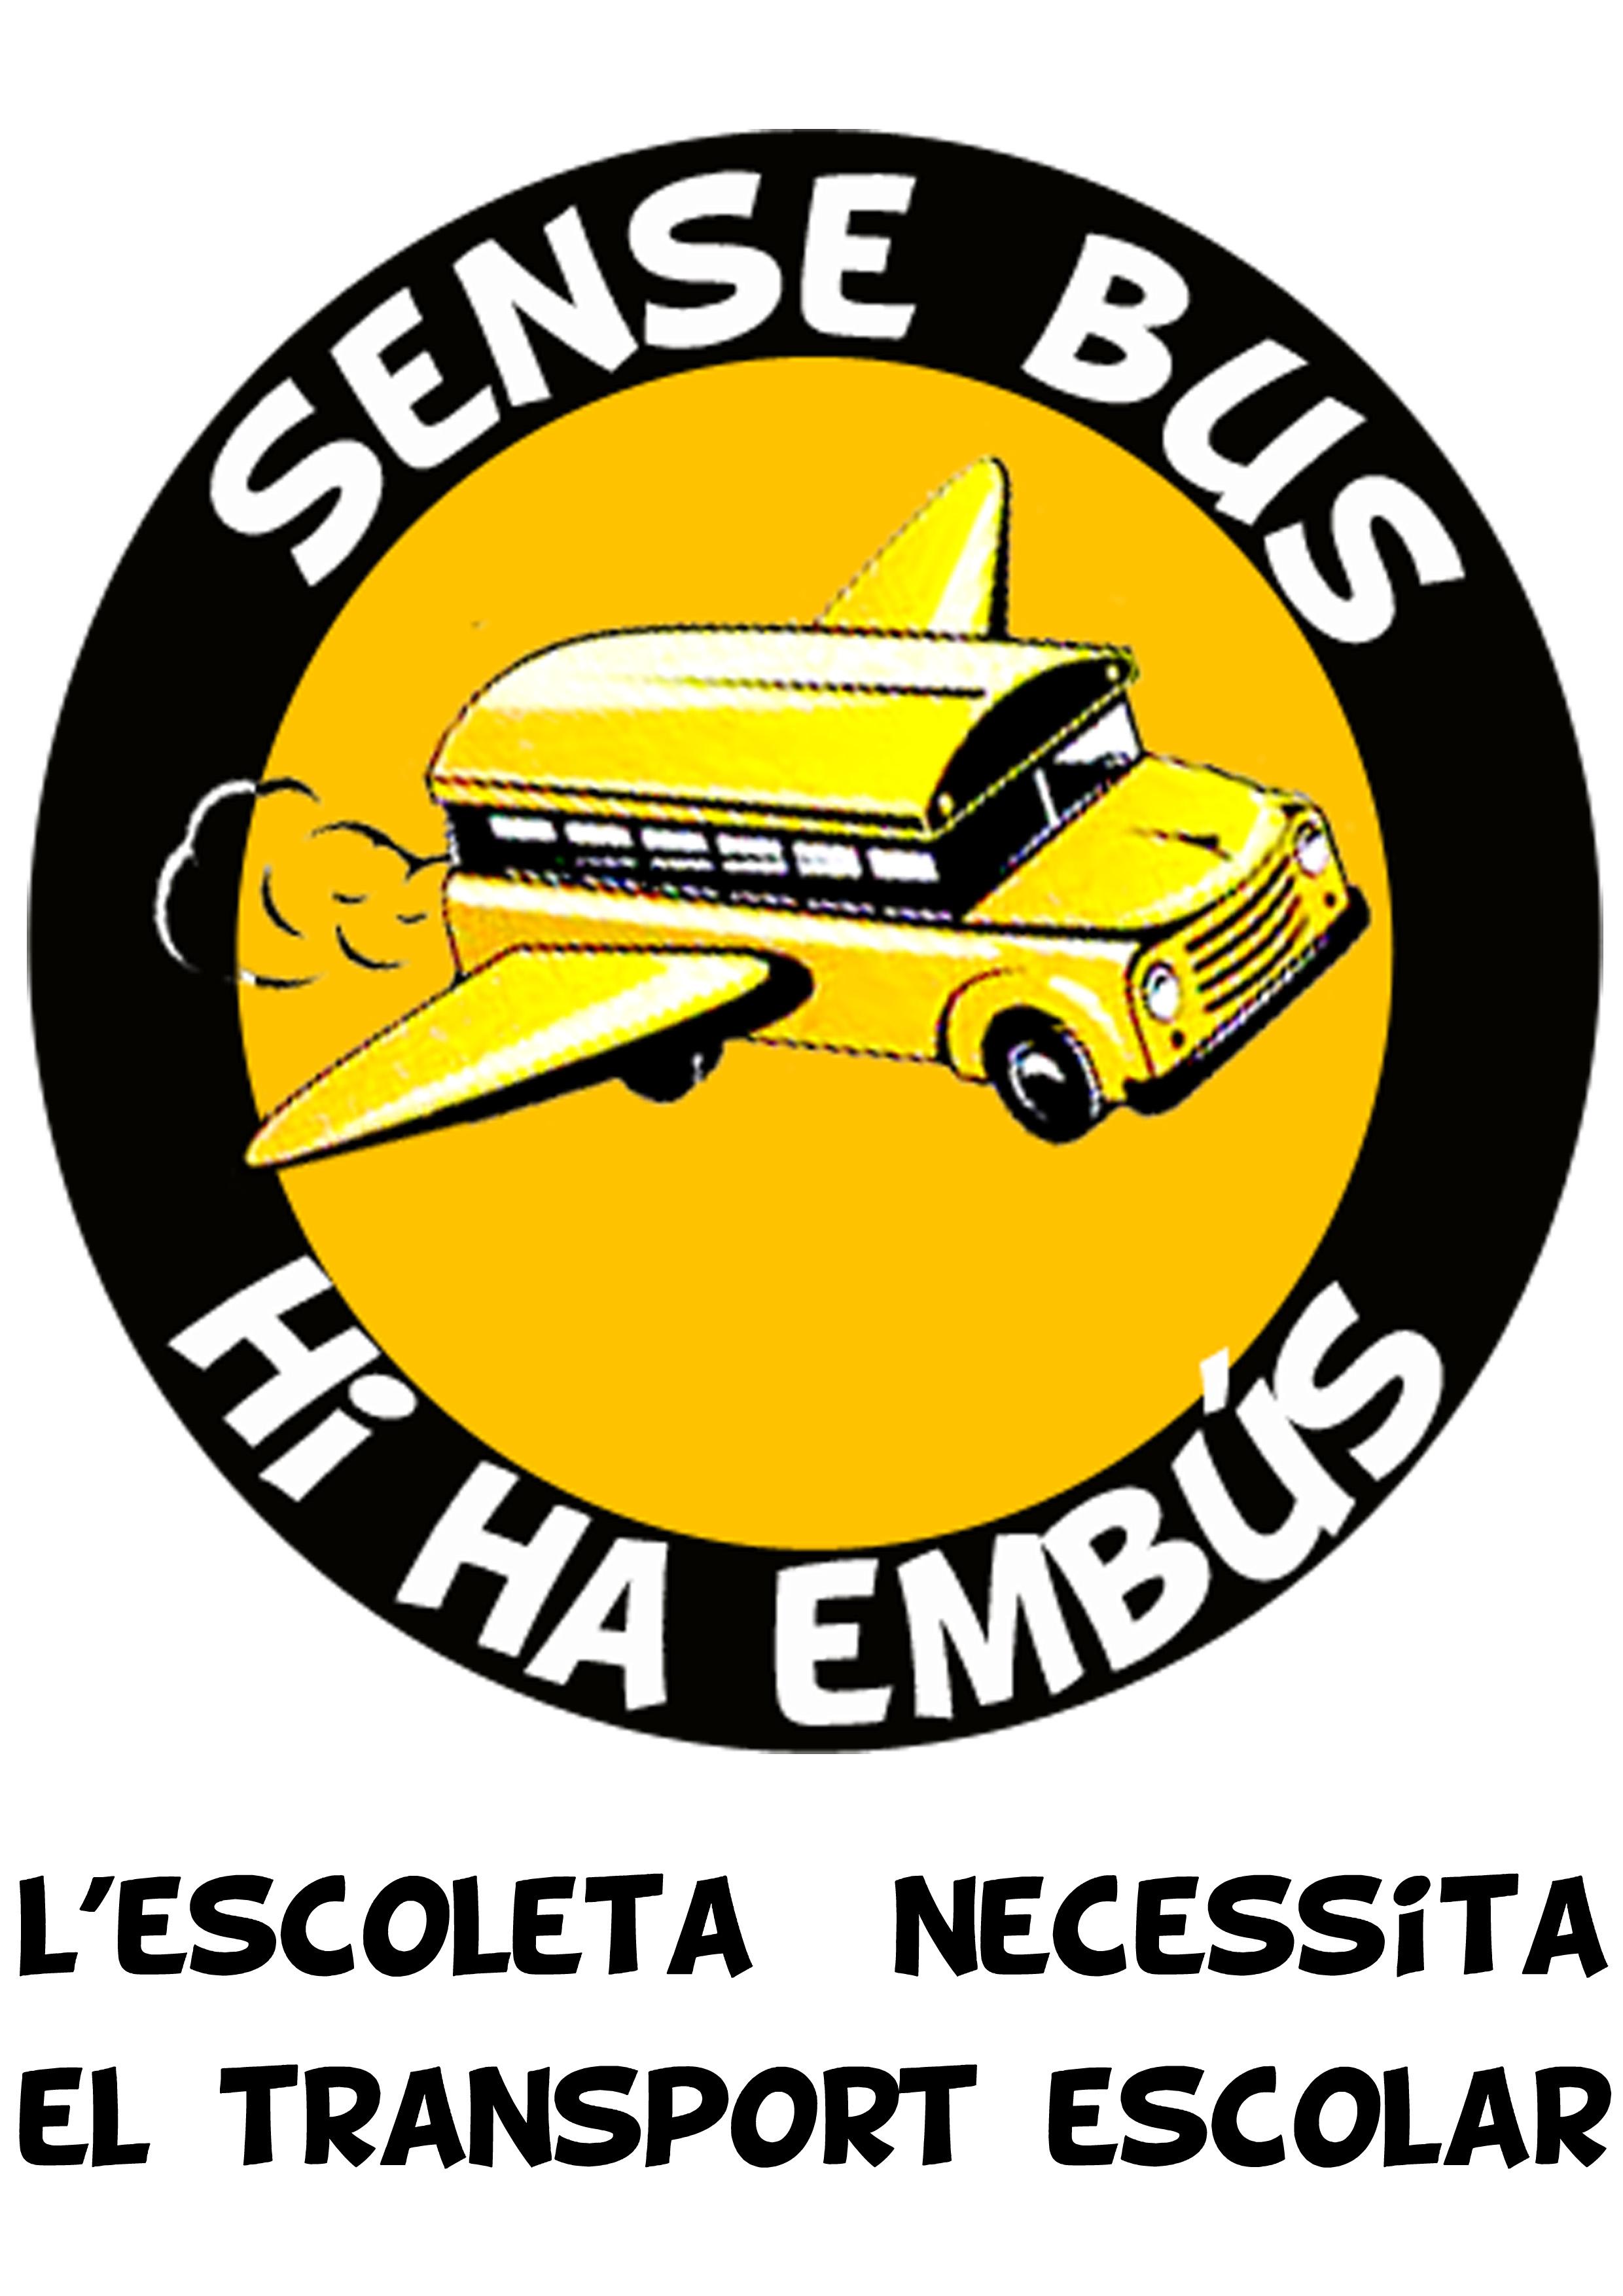 Sense bus hi ha embús